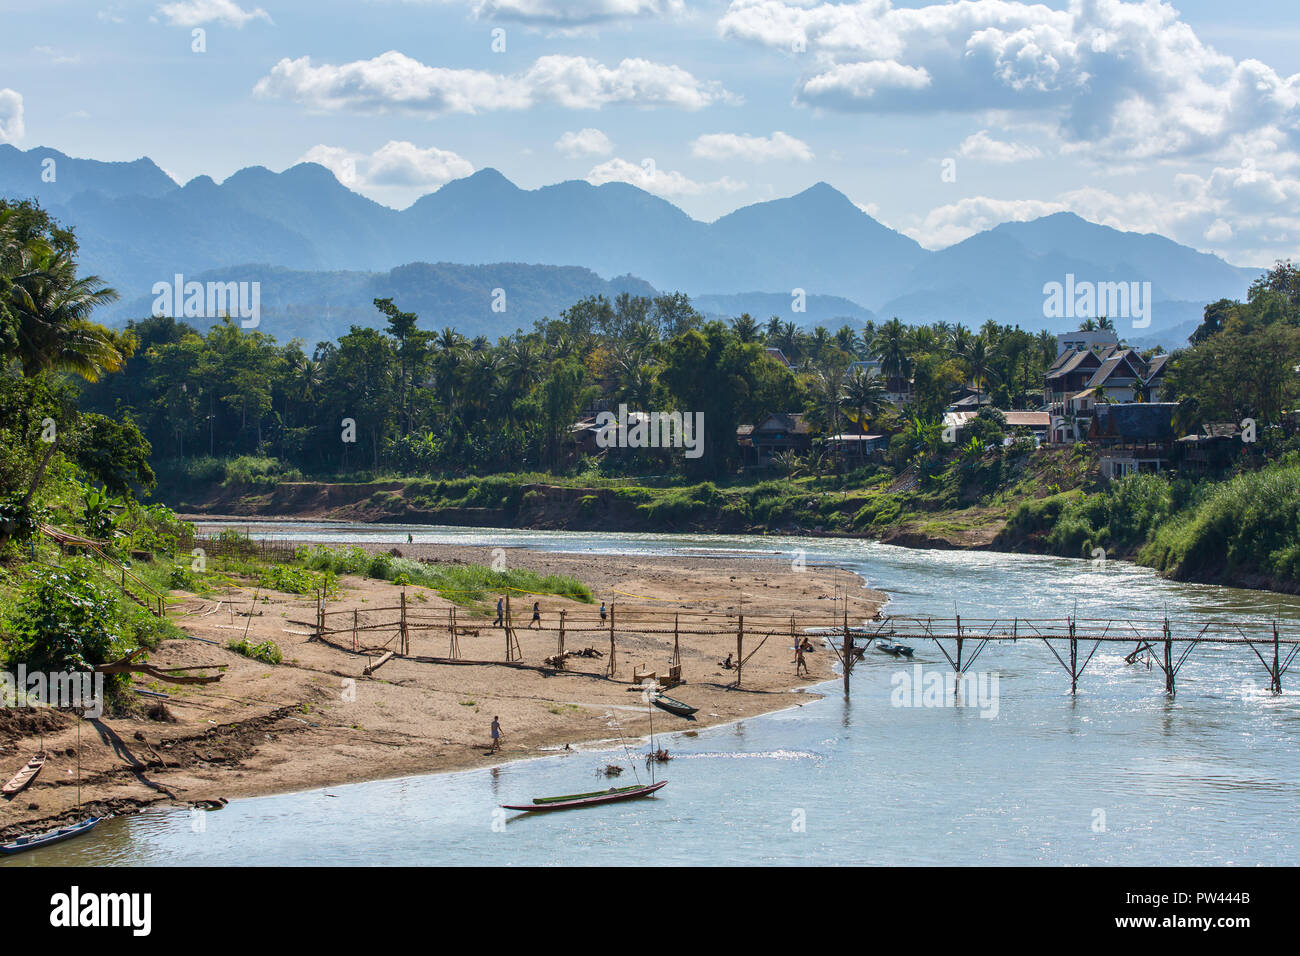 Wooden bridge over Nam khan rive in Luang Prabang, Laos - Stock Image